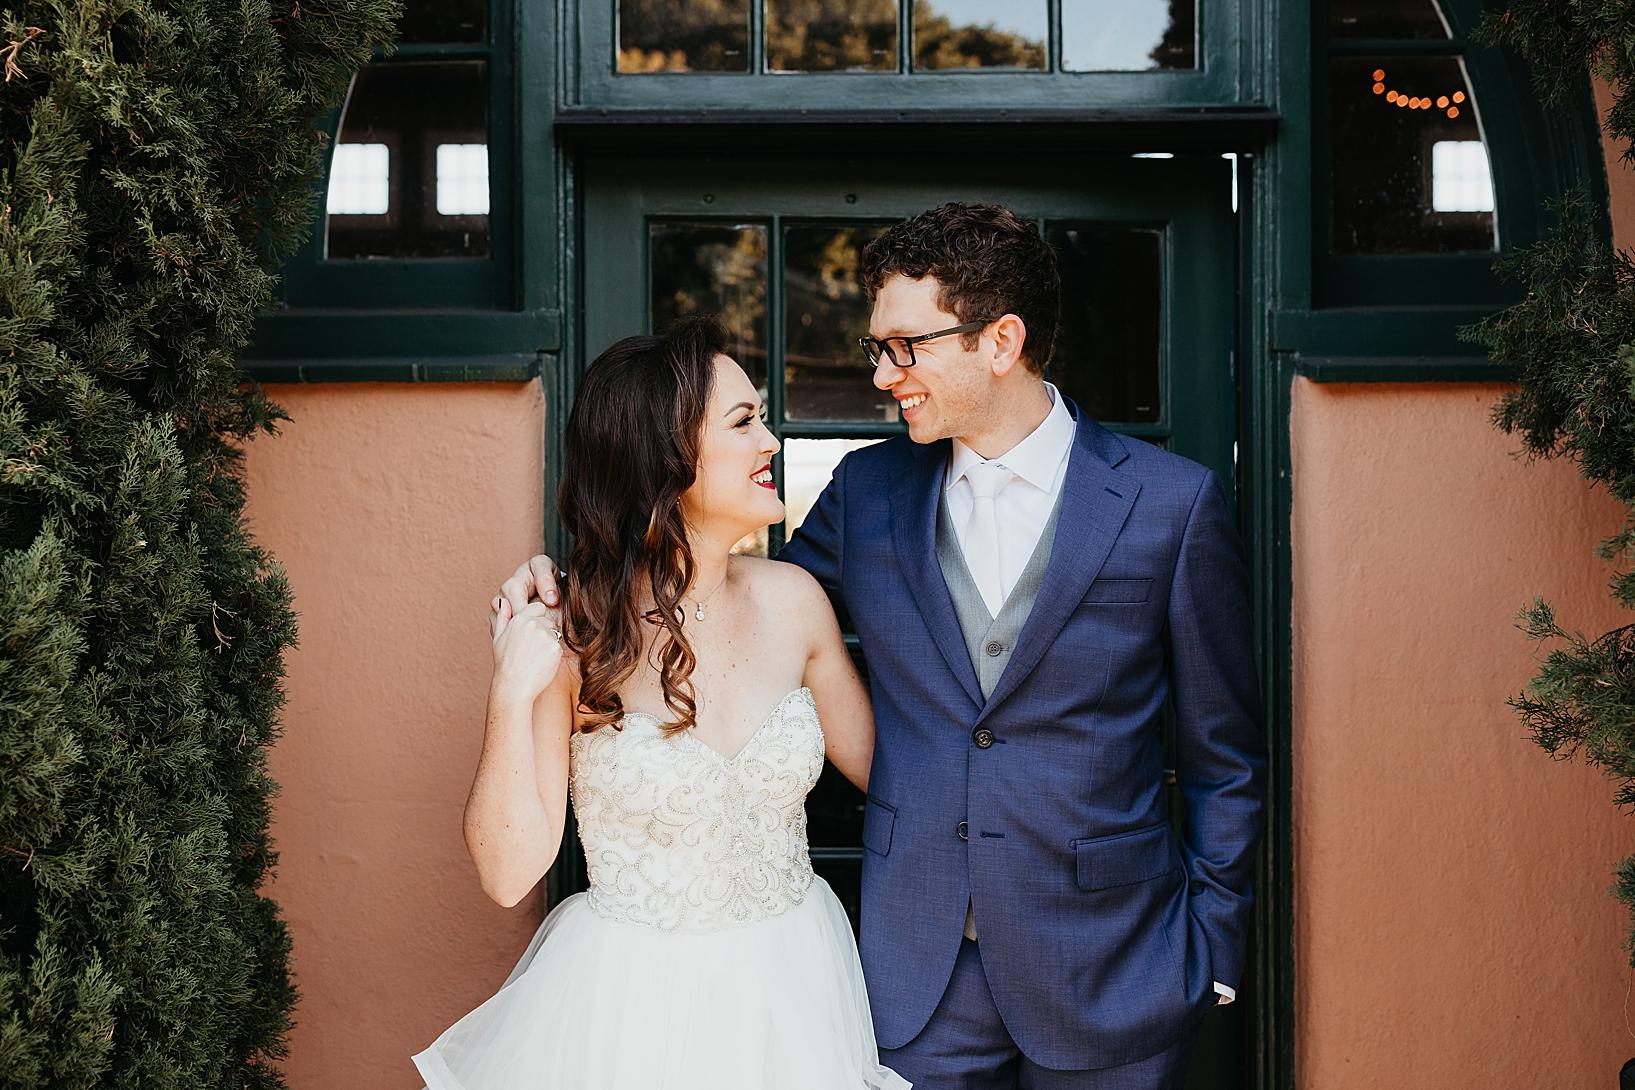 Brick-San-Diego-Winter-Wedding-35.jpg